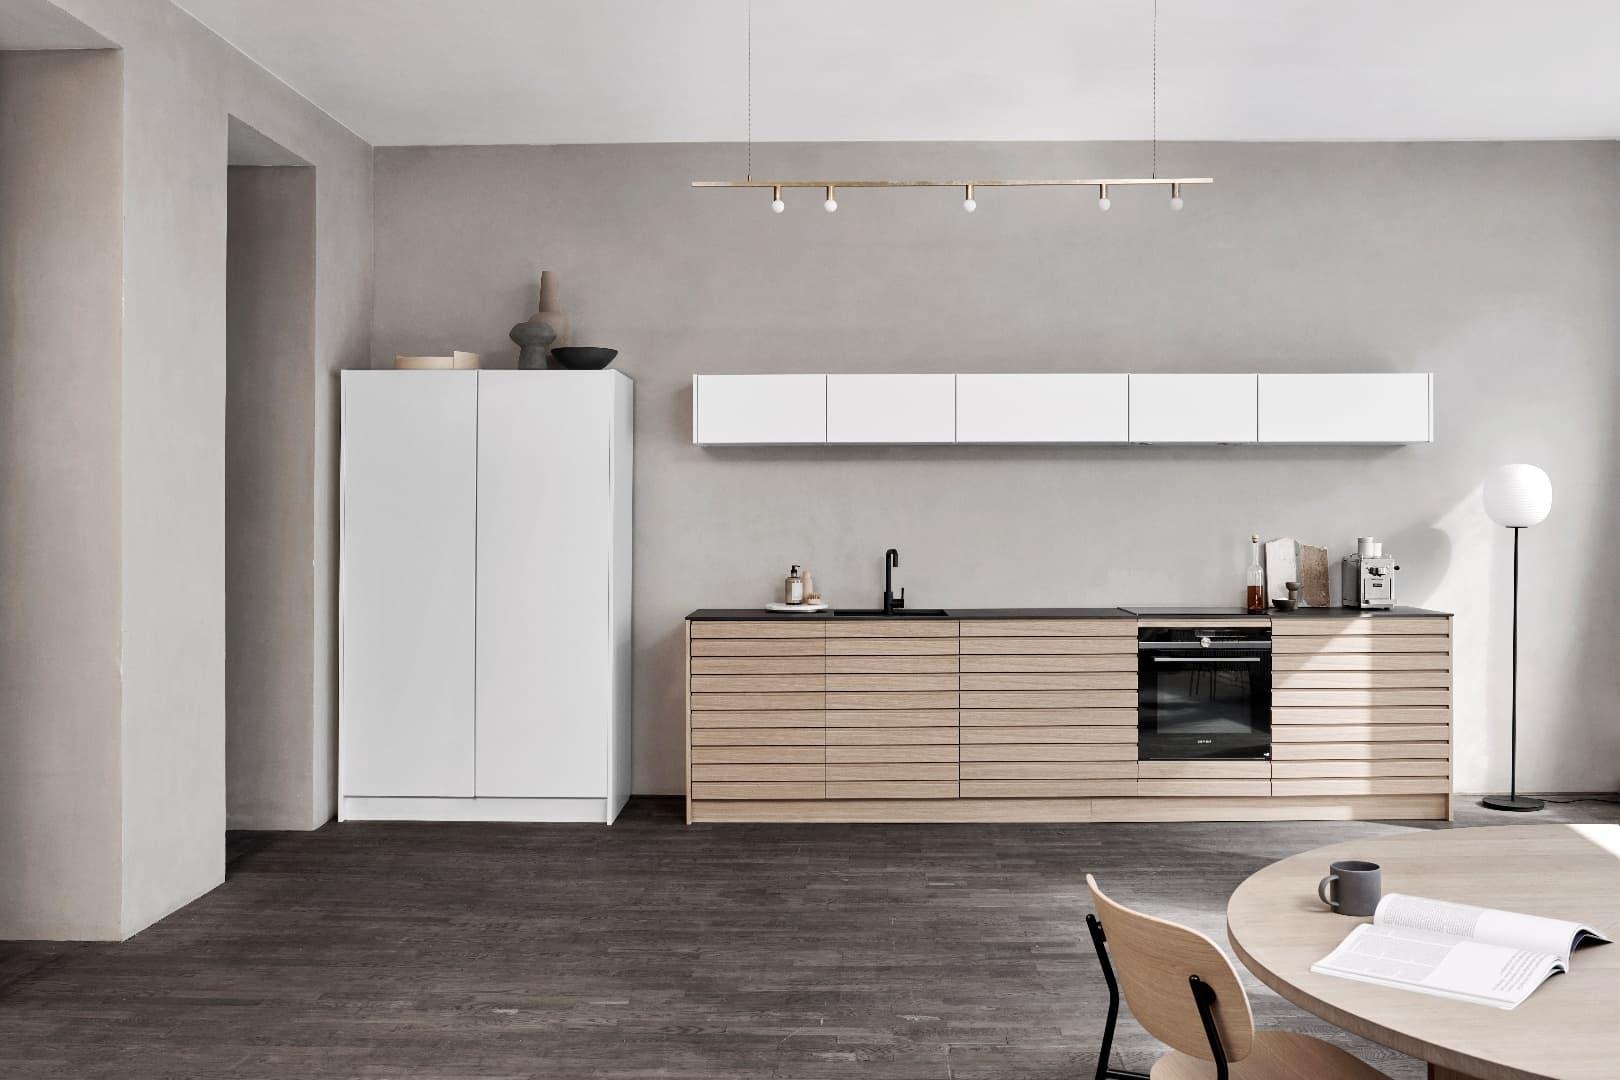 Kvik_kitchen_cimalightoak_main_infront.jpg